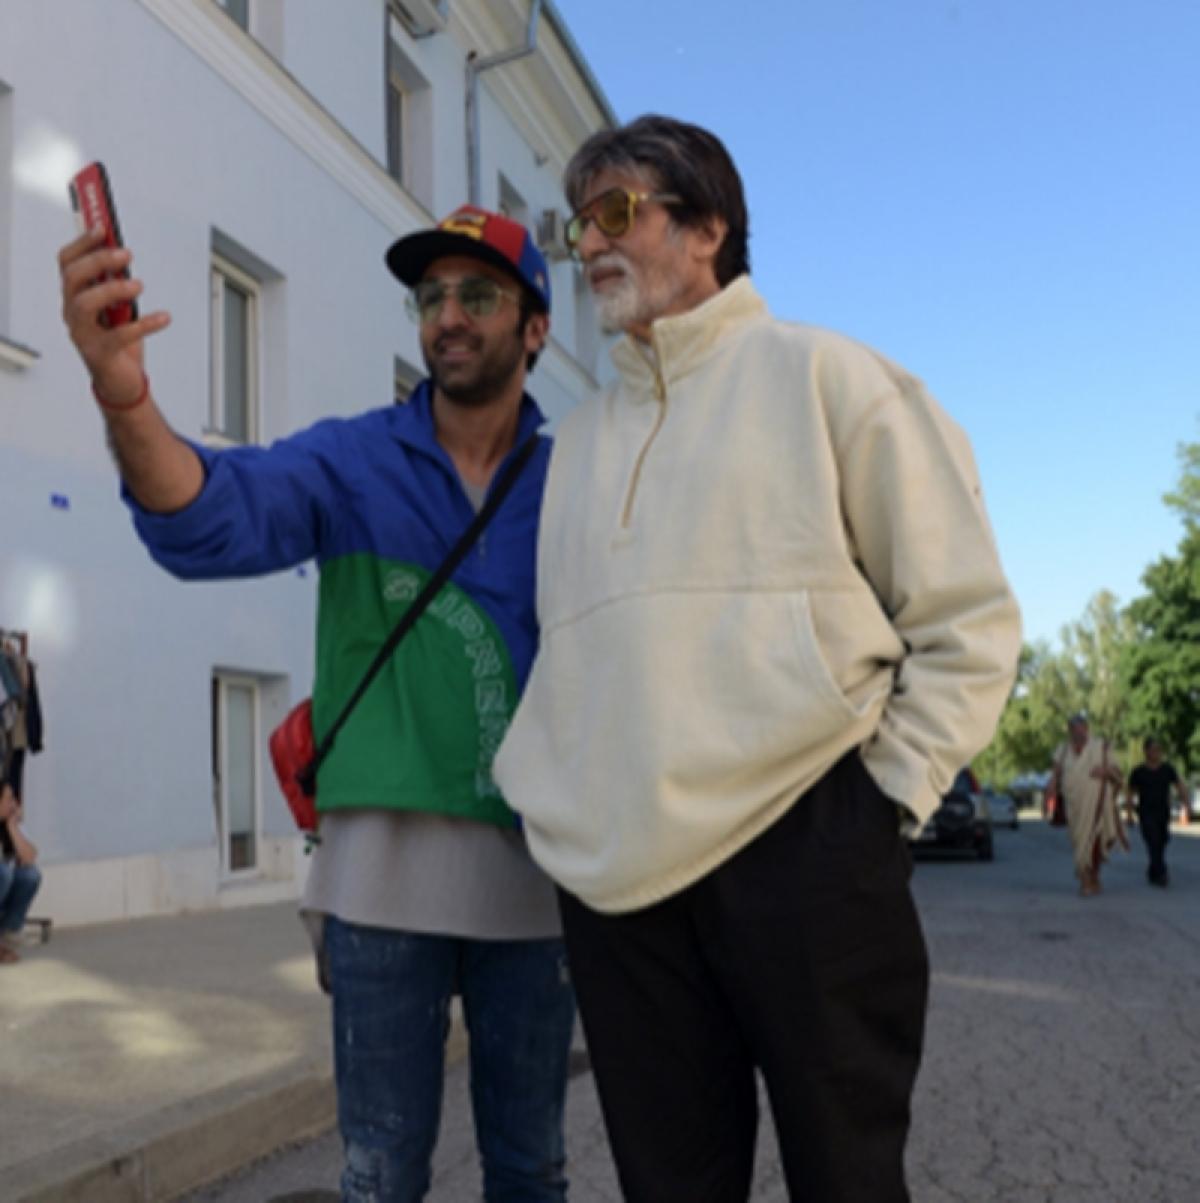 'Brahmastra': Amitabh Bachchan takes a stroll in New York with Ranbir Kapoor